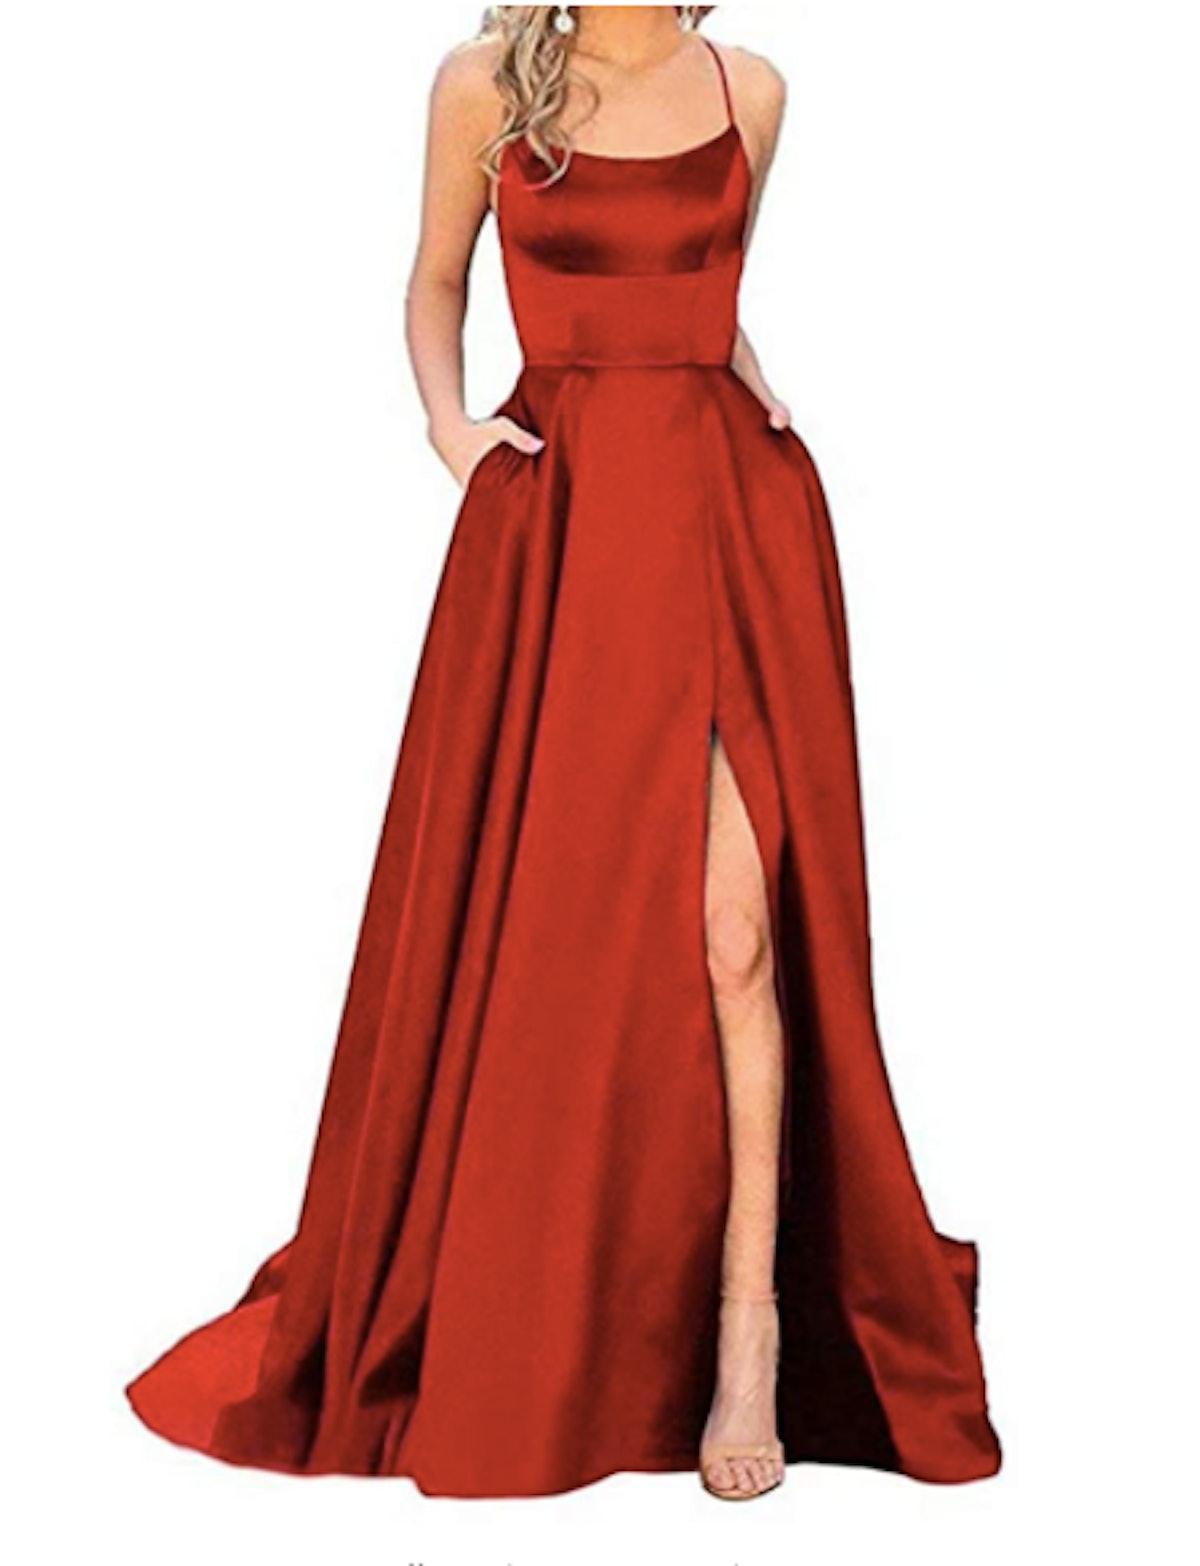 Red Spaghetti Strap Satin Dress